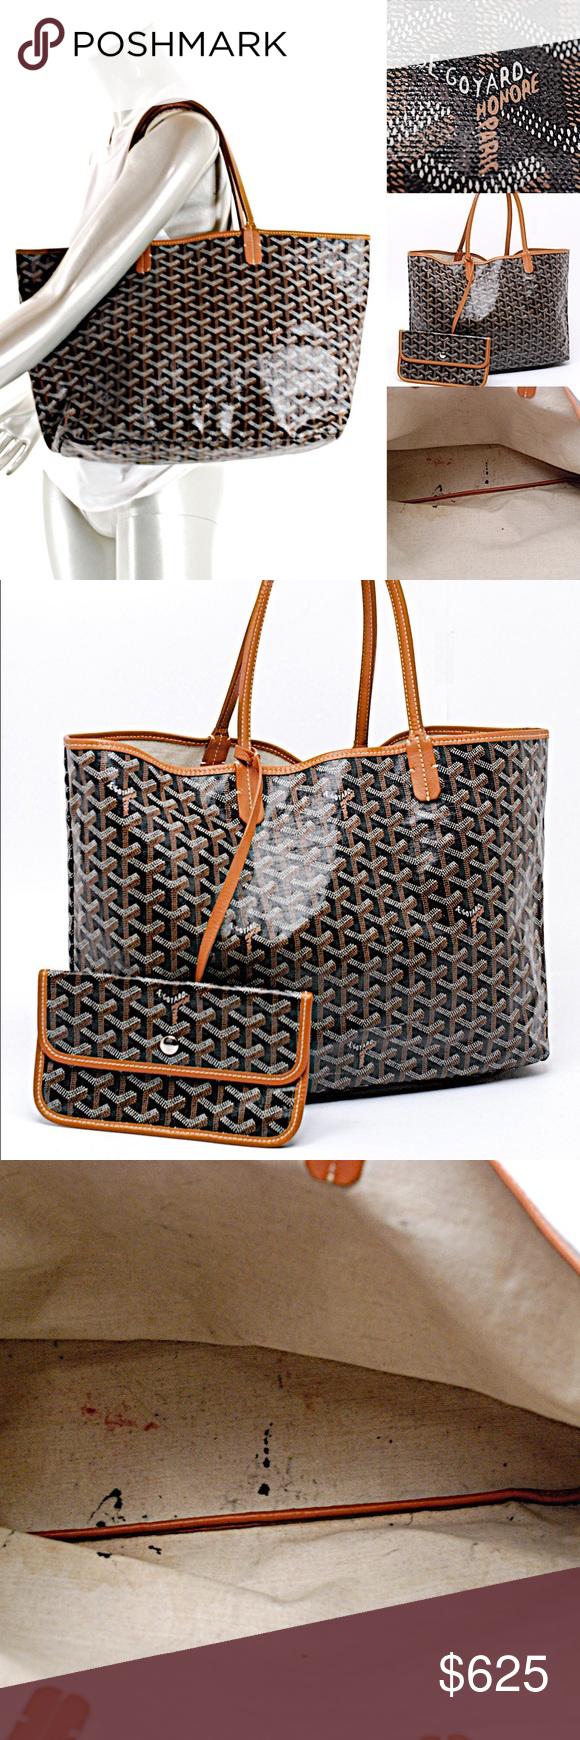 Goyard St Louis Tote Bag Bergdorf Goodman Purchased At